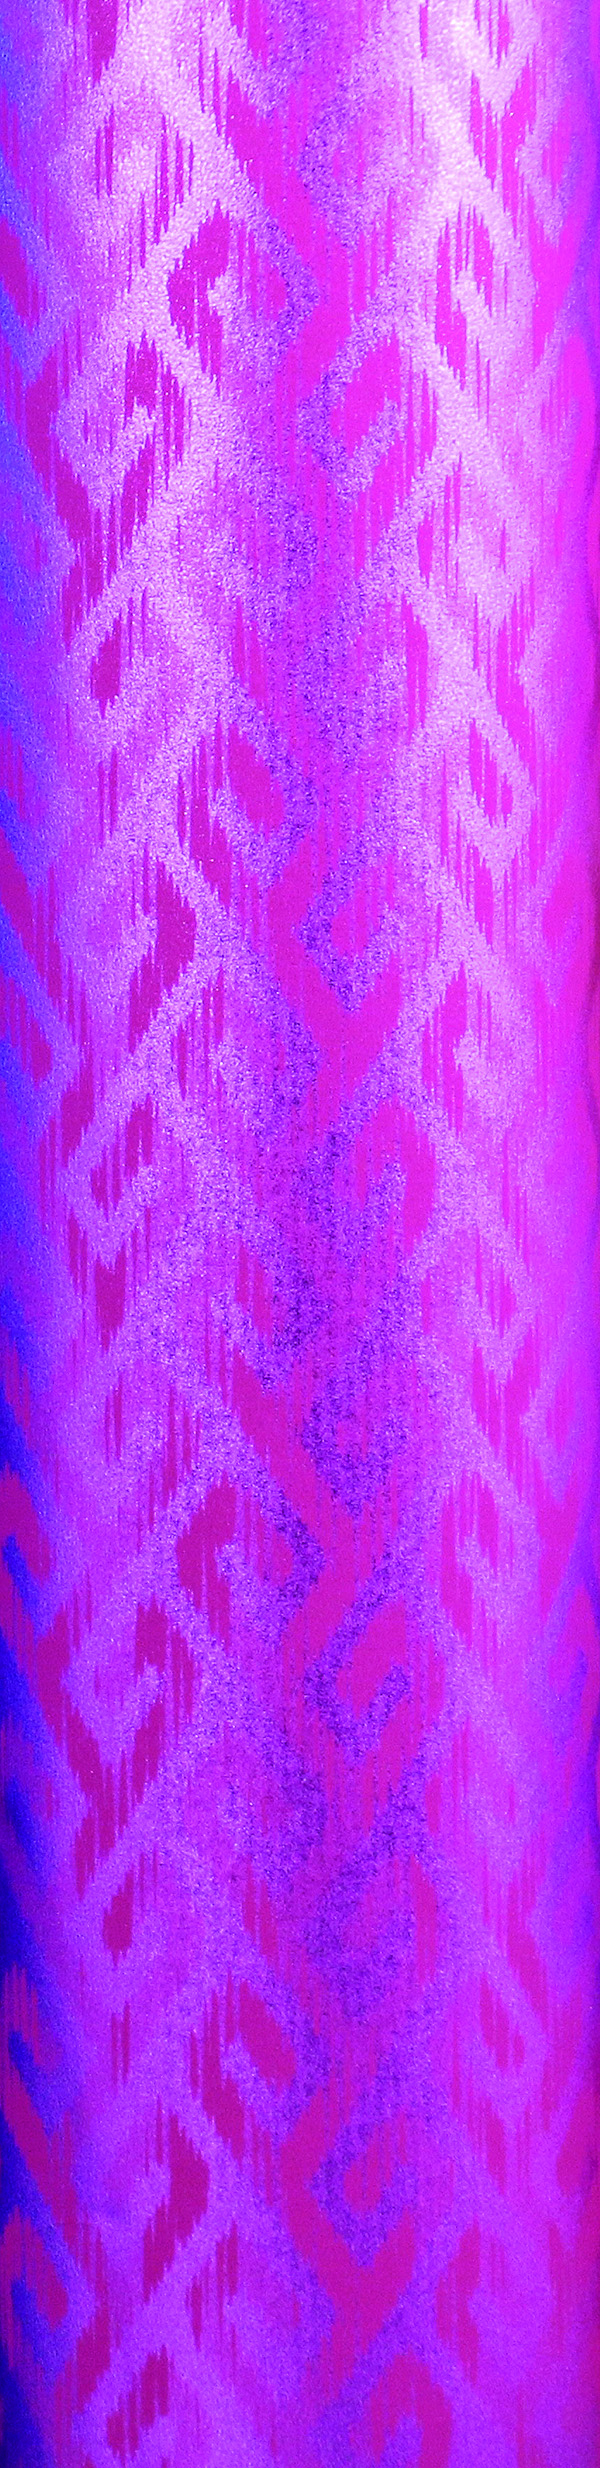 PA854 Jewelers Roll Giftwrap- Fuchsia Spice